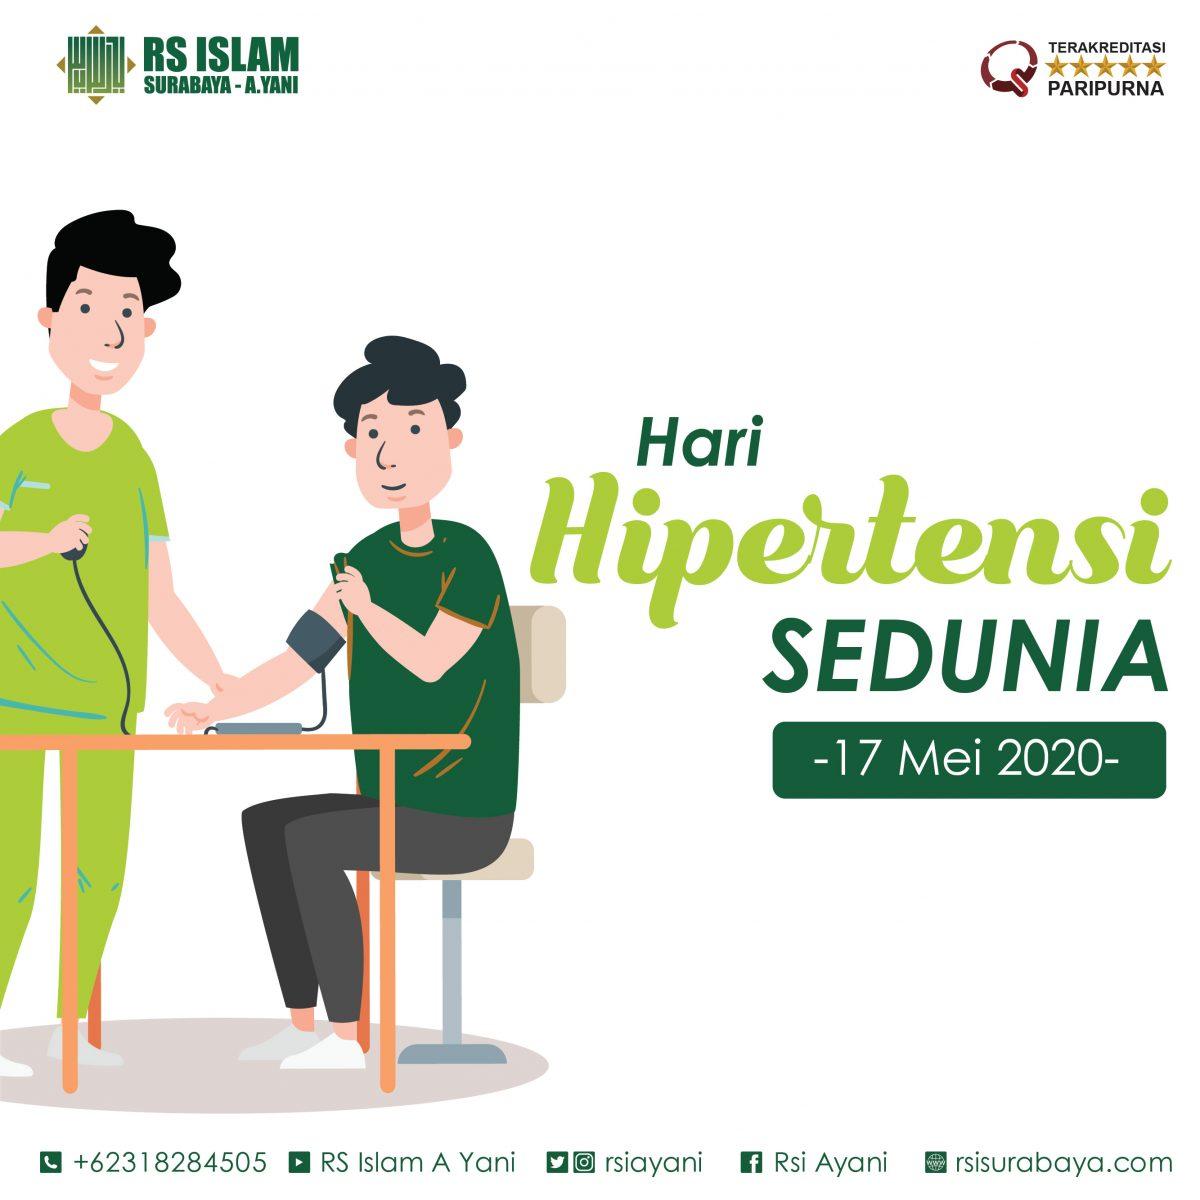 hipertensi-rsi-01-01-01-1200x1200.jpg